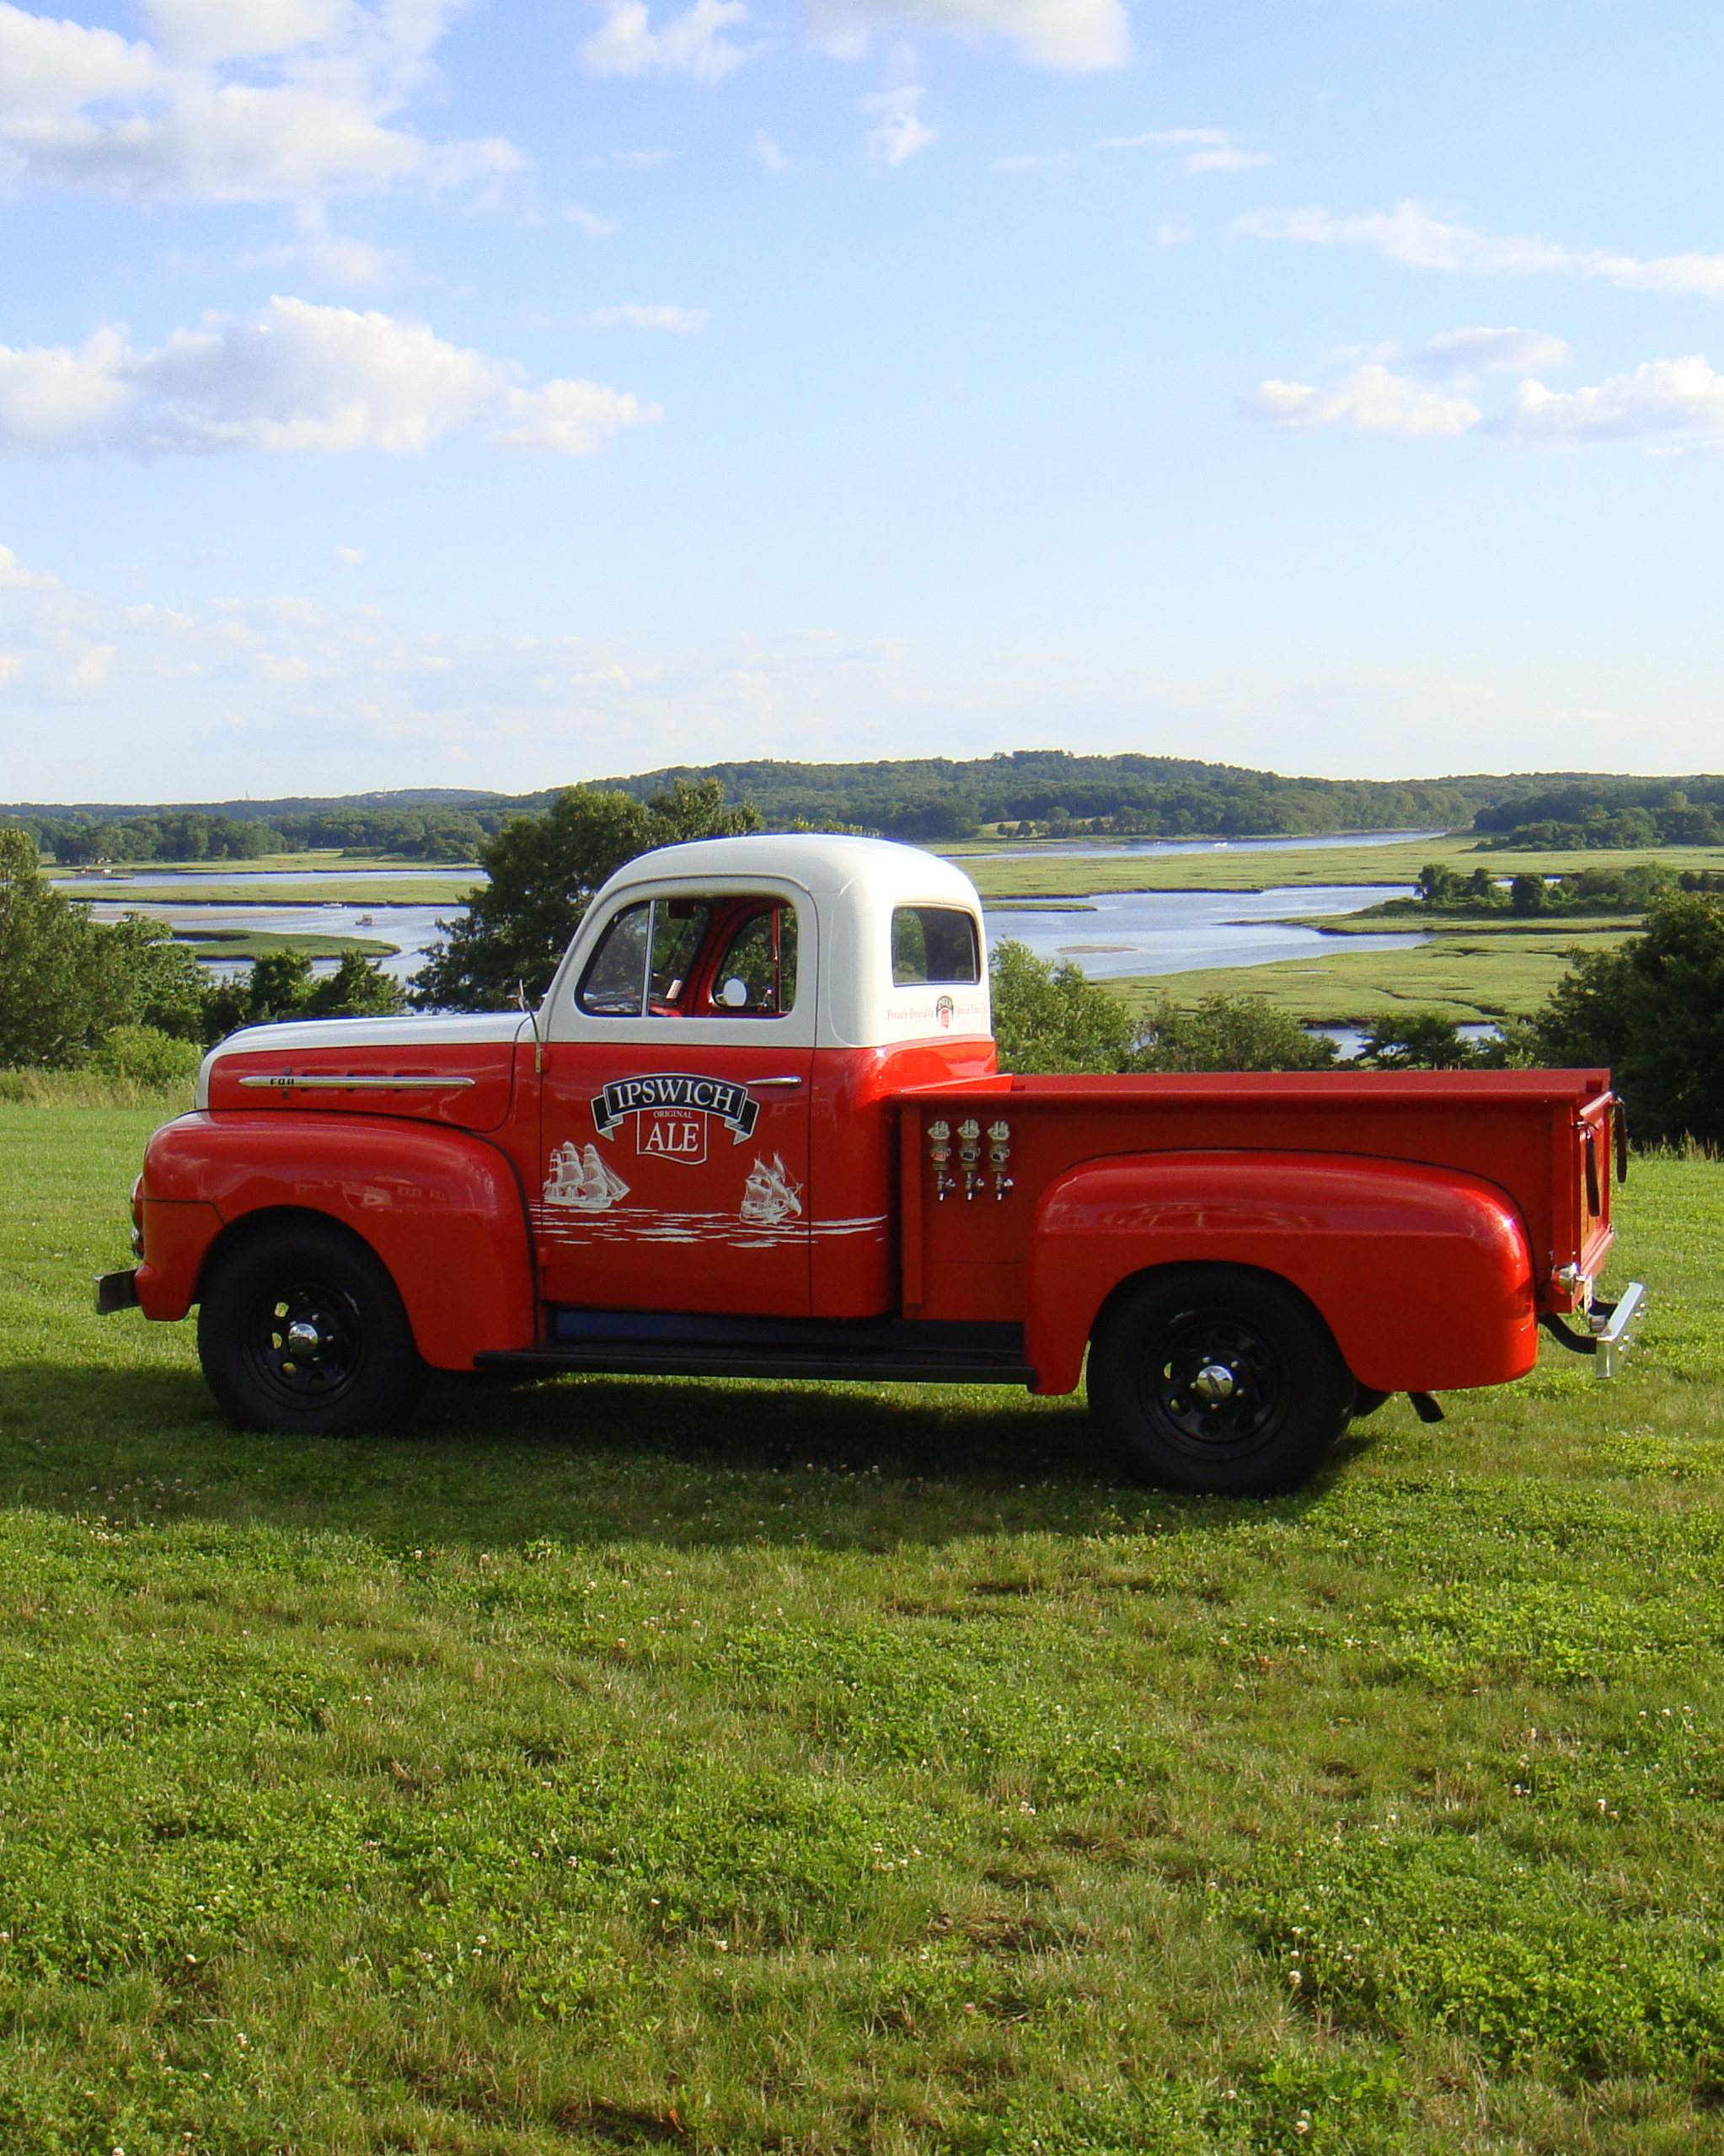 book-mobile-bar-tapmobile-big-red-truck-0914.jpg